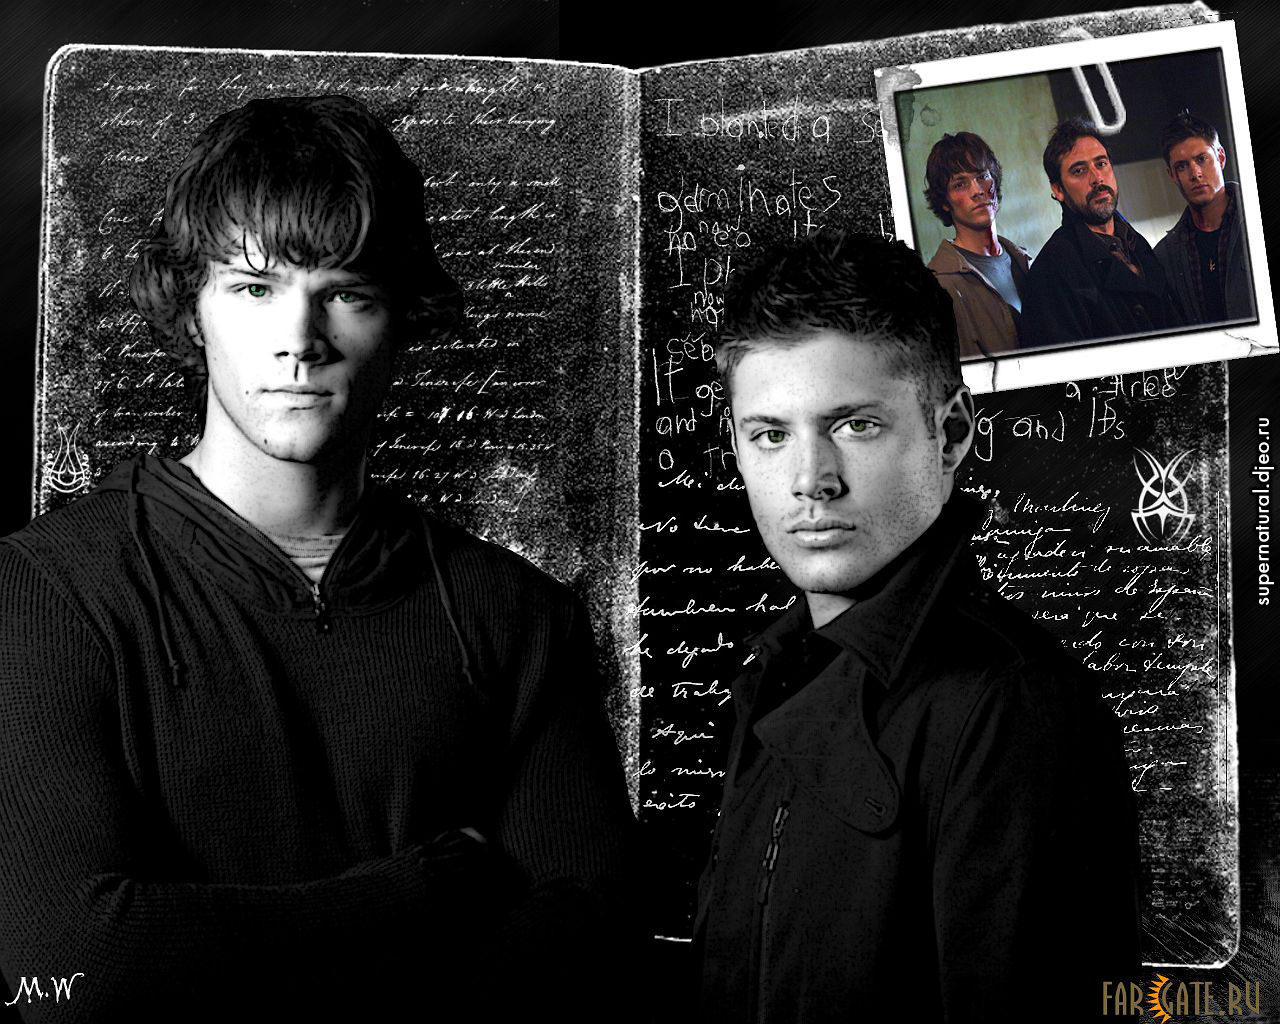 http://supernatural.djeo.ru/images_large/wallpapers/pic007.jpg